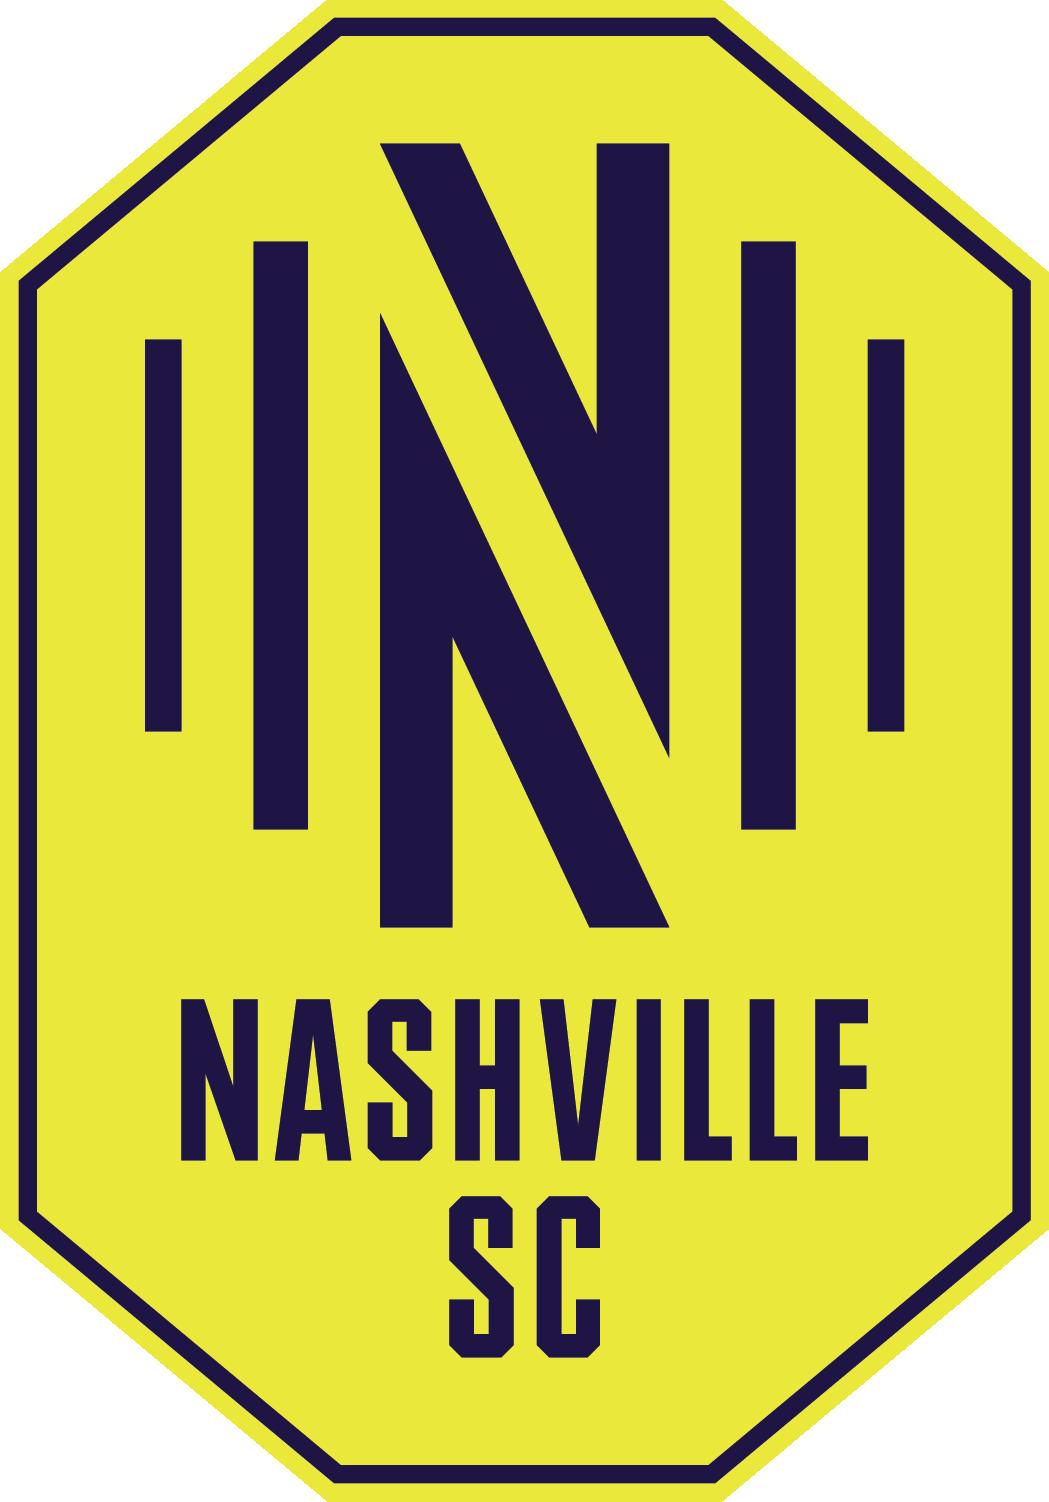 Nashville Soccer Club